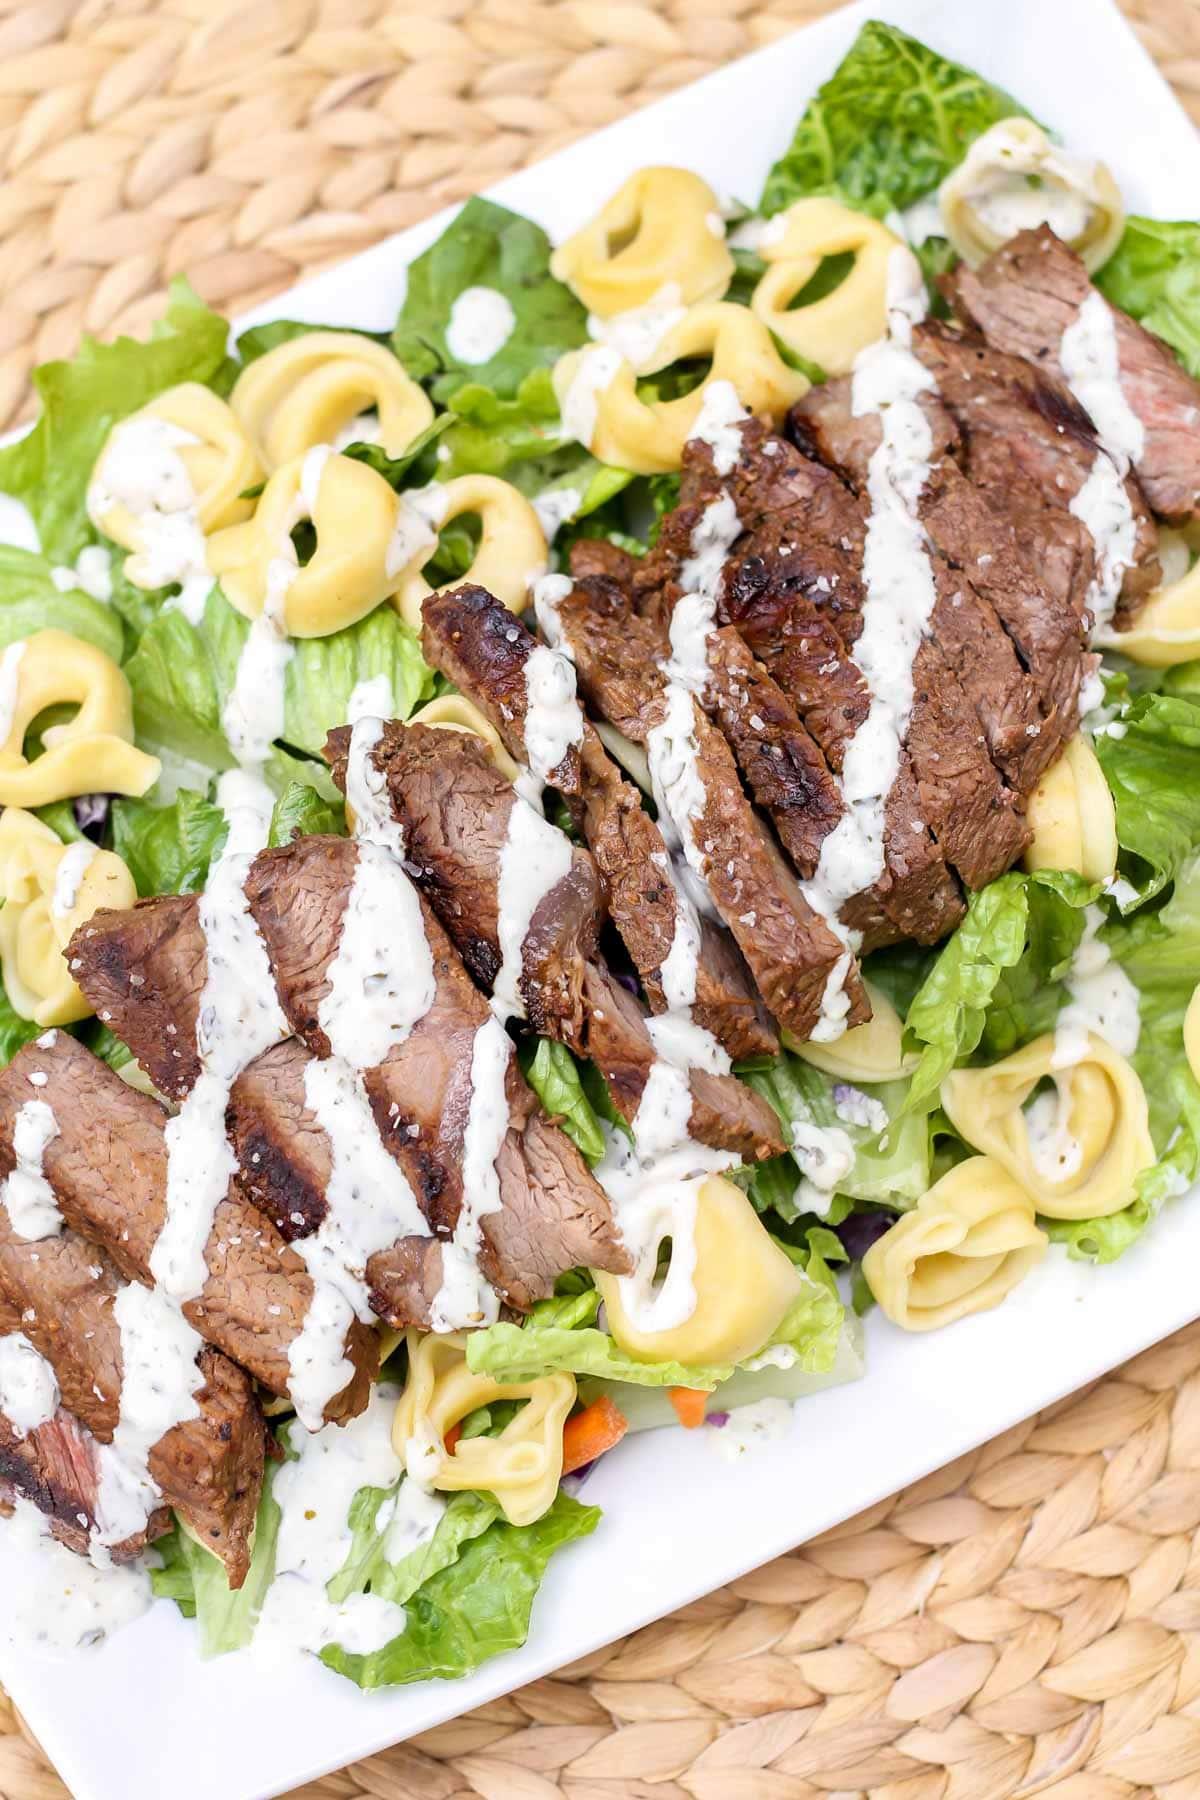 Steak and tortellini salad dressed on a white plate